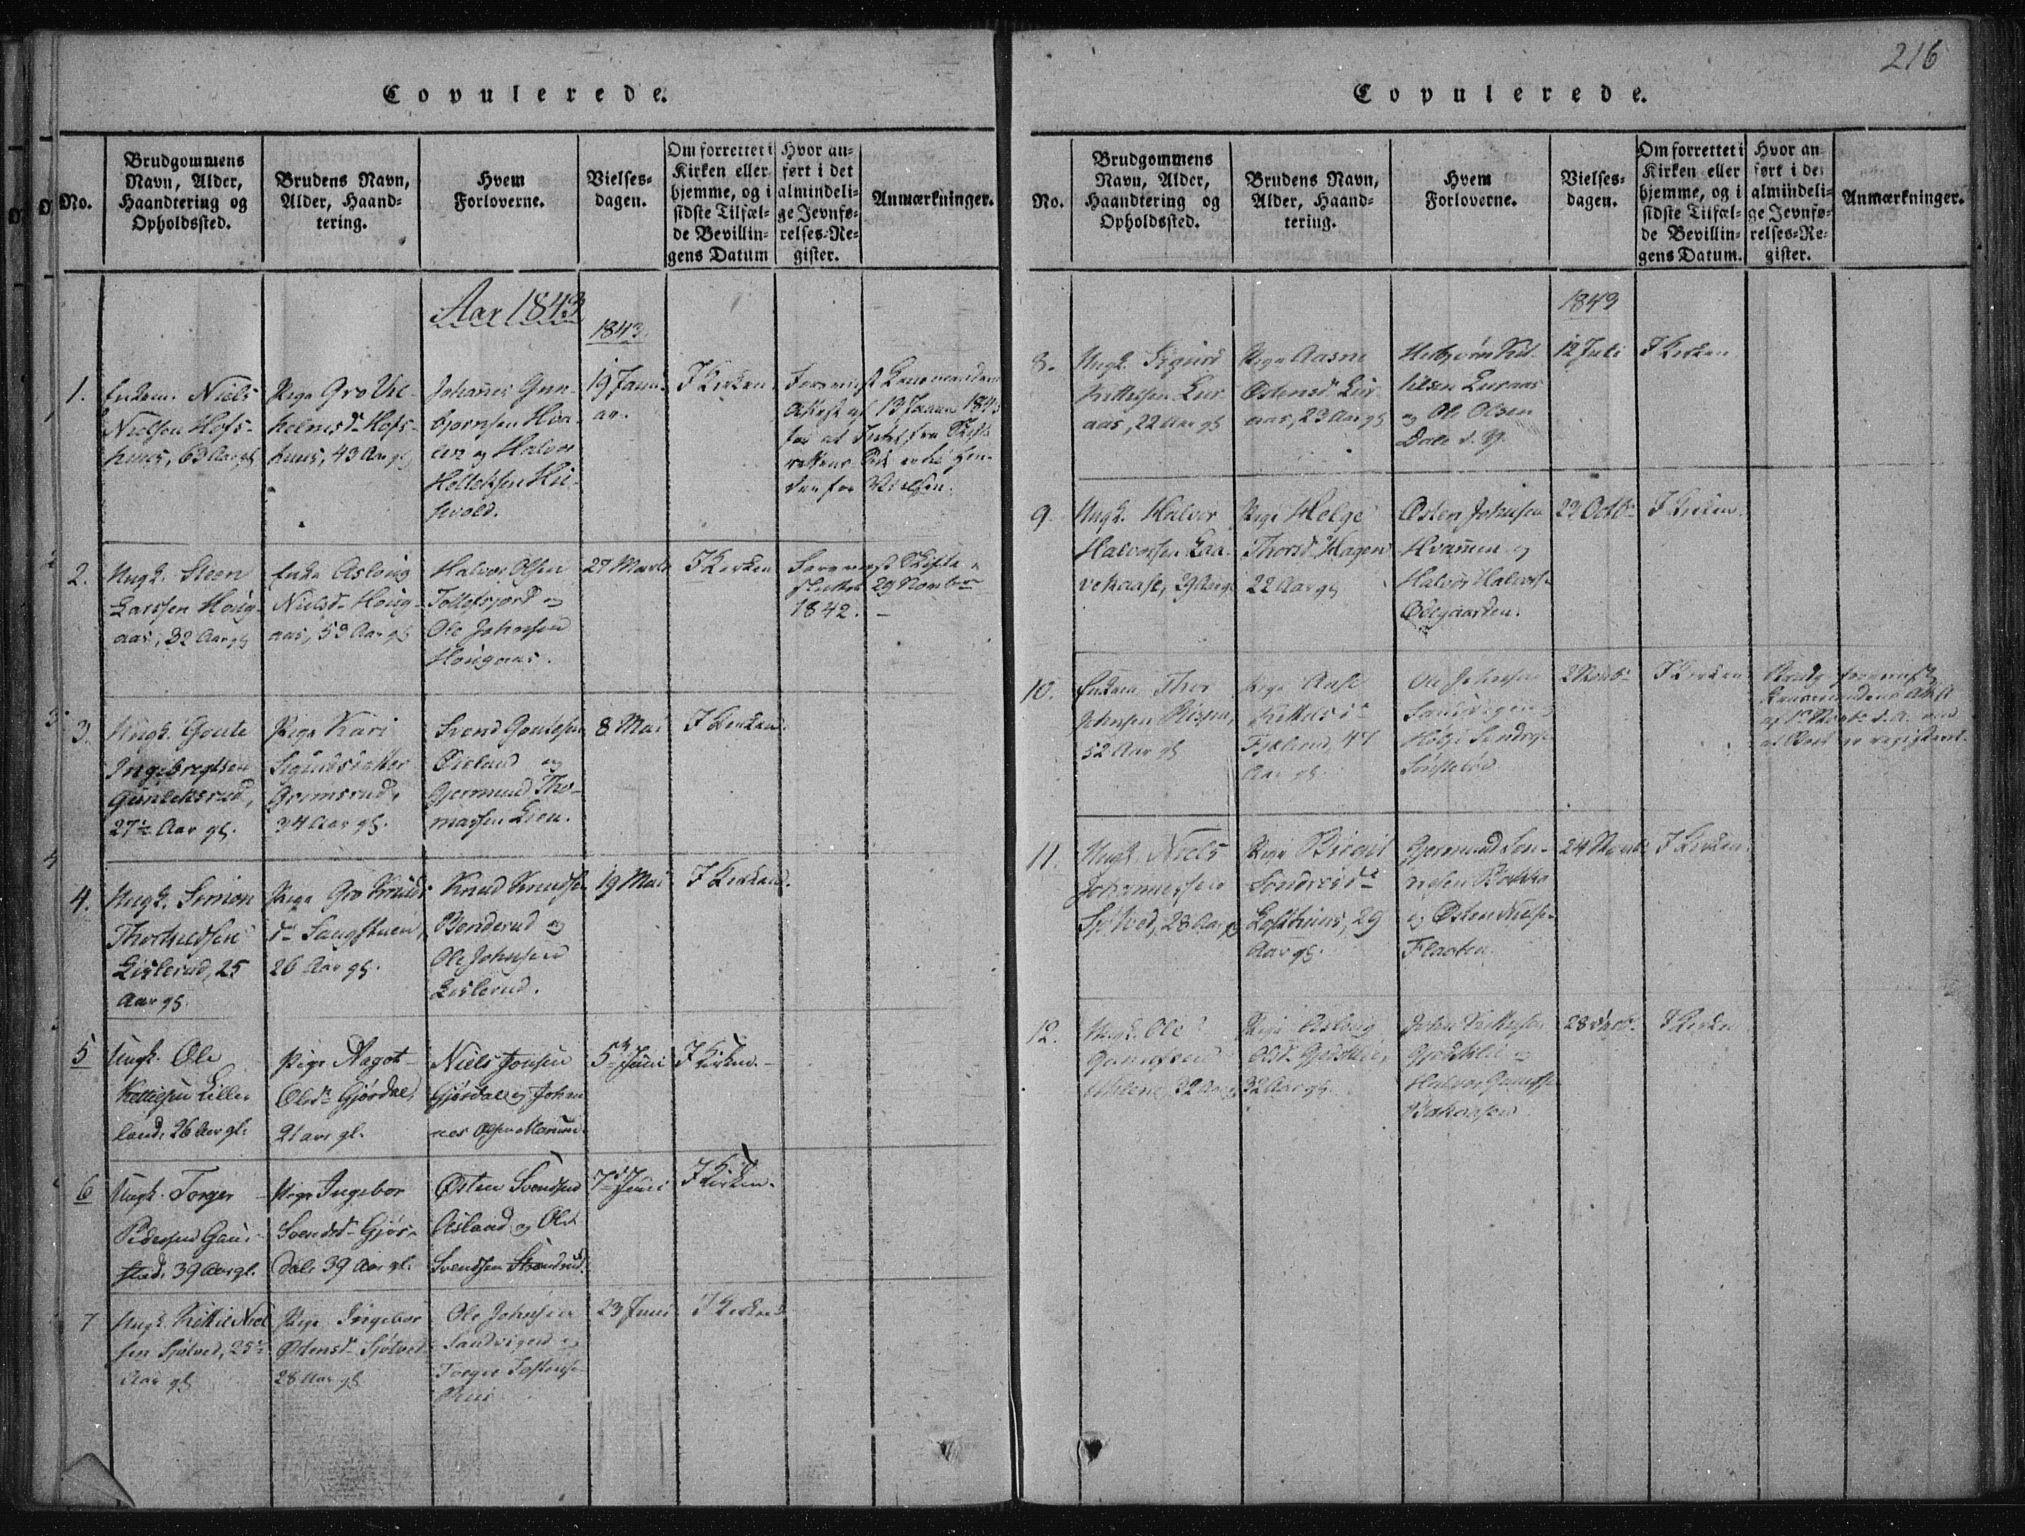 SAKO, Tinn kirkebøker, F/Fa/L0004: Ministerialbok nr. I 4, 1815-1843, s. 216